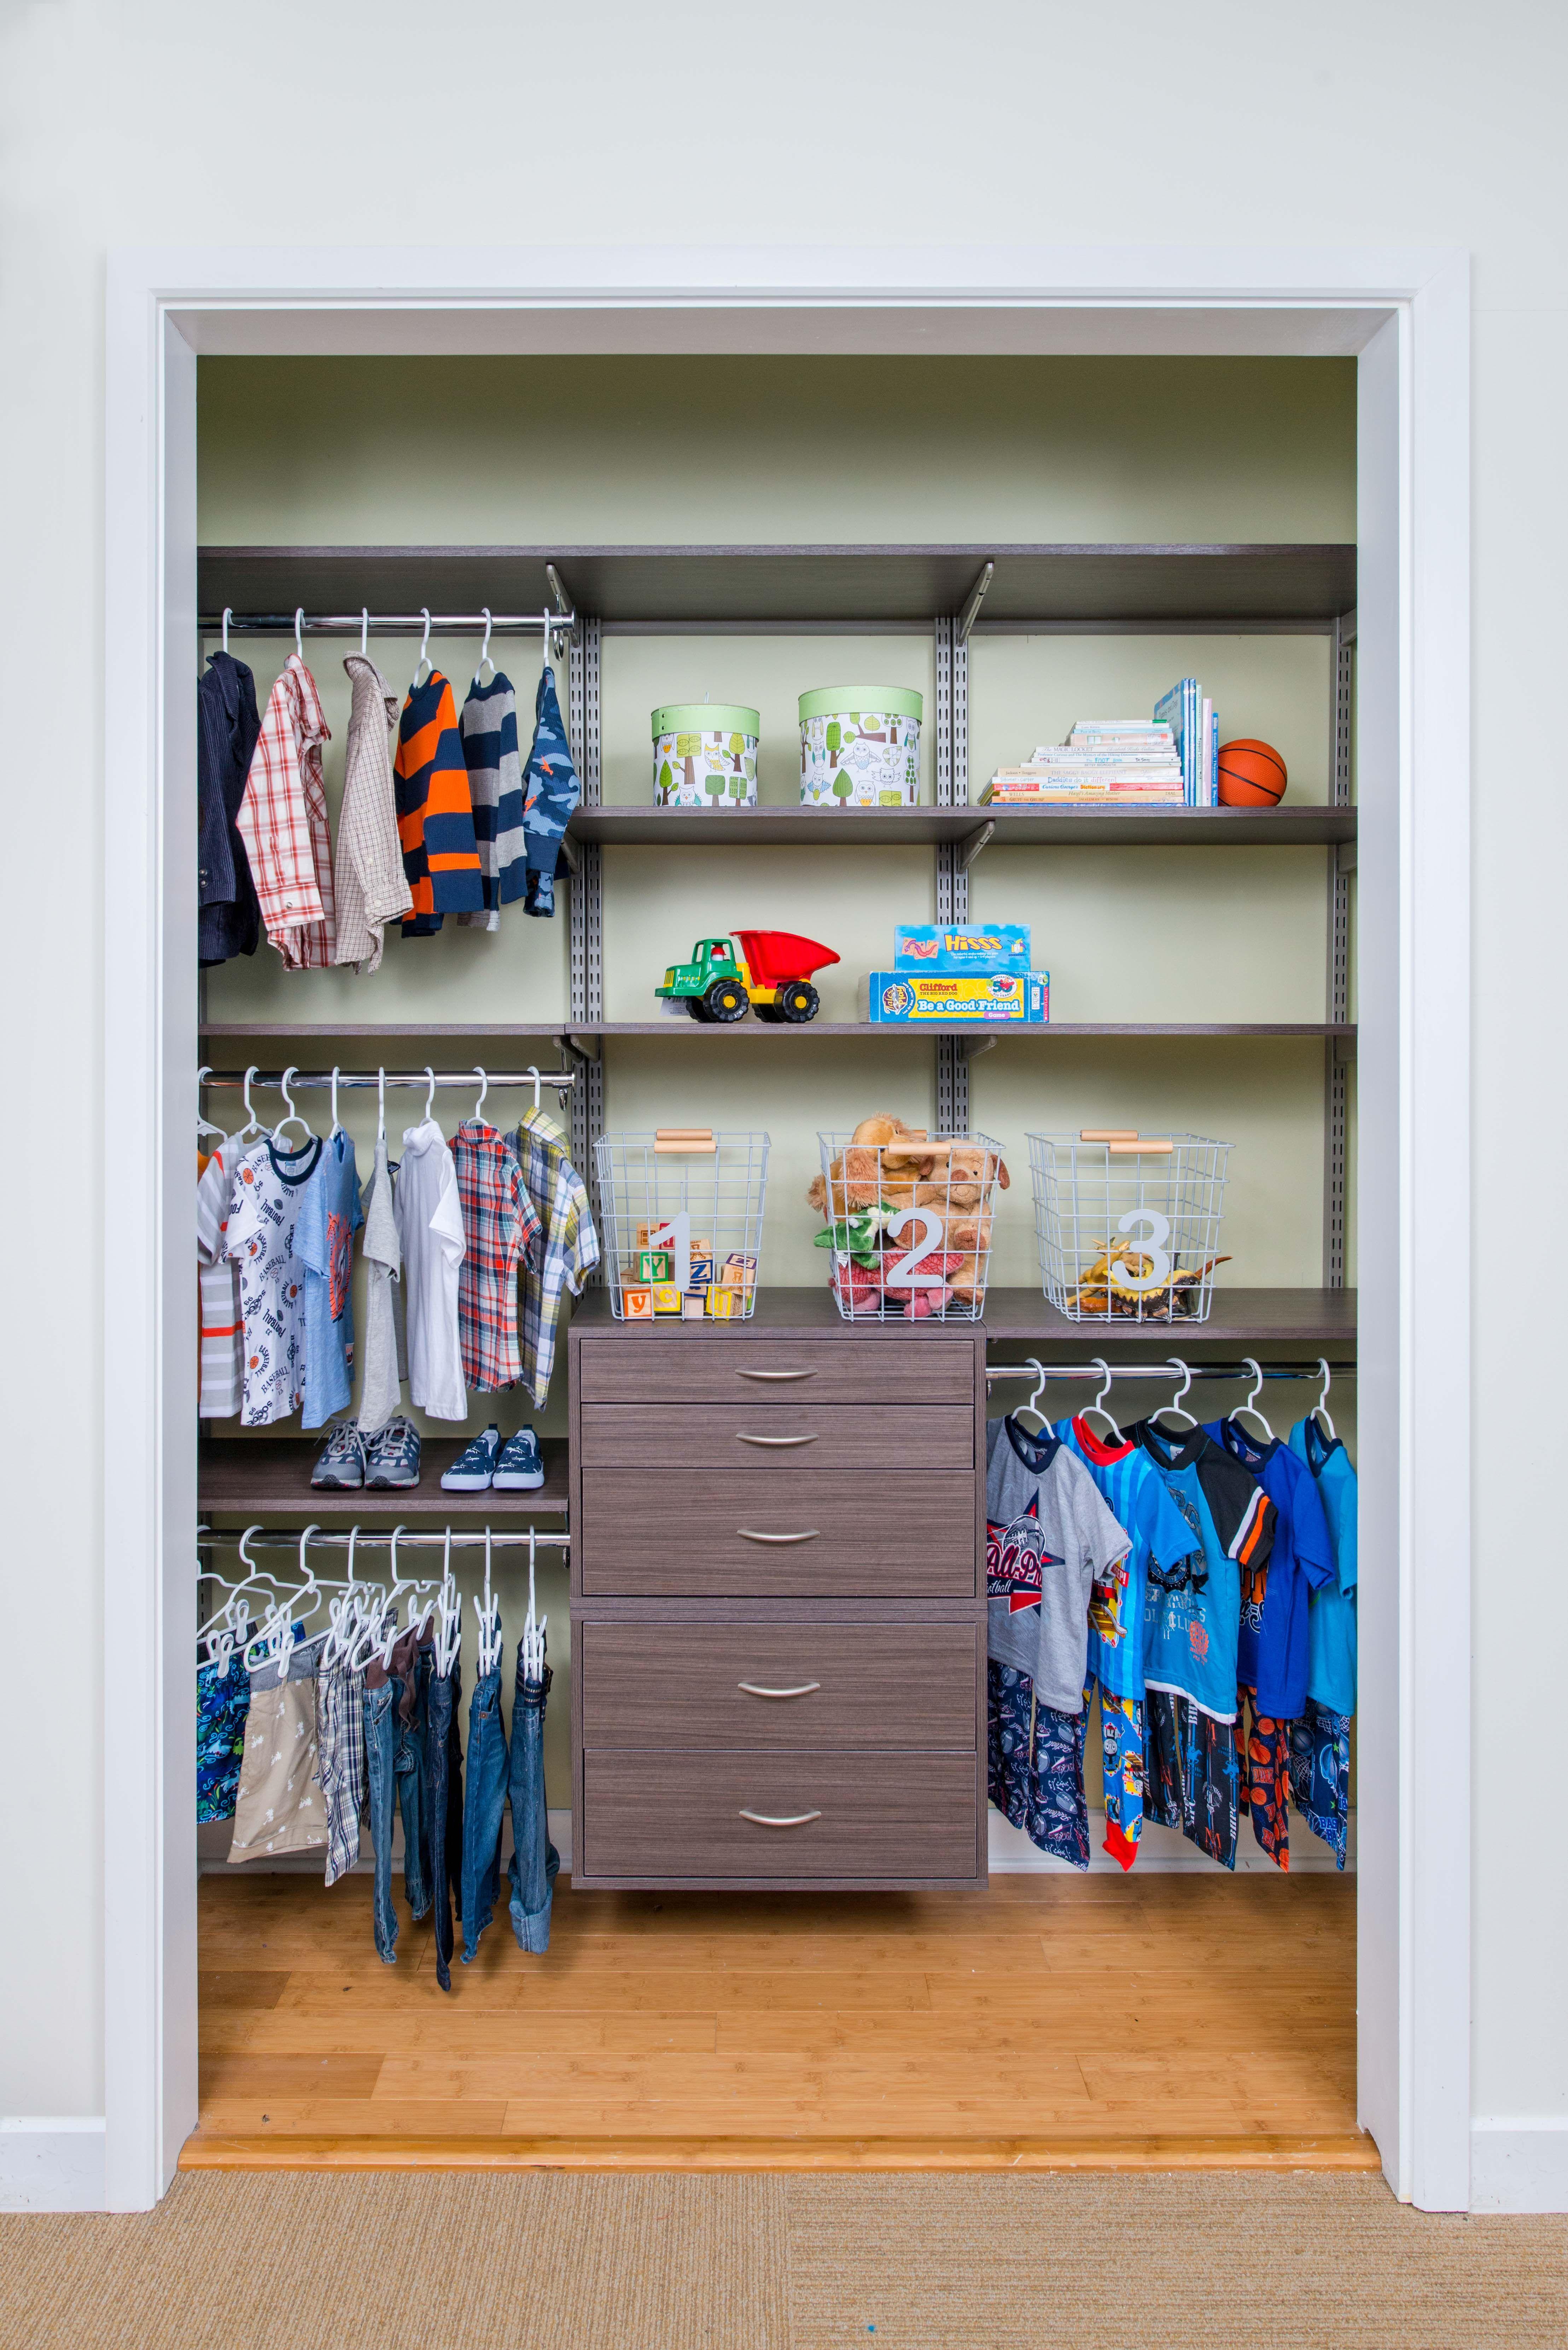 Pin By Chattanooga Closet Company On Childrenu0027s Closets U0026 Storage Space |  Pinterest